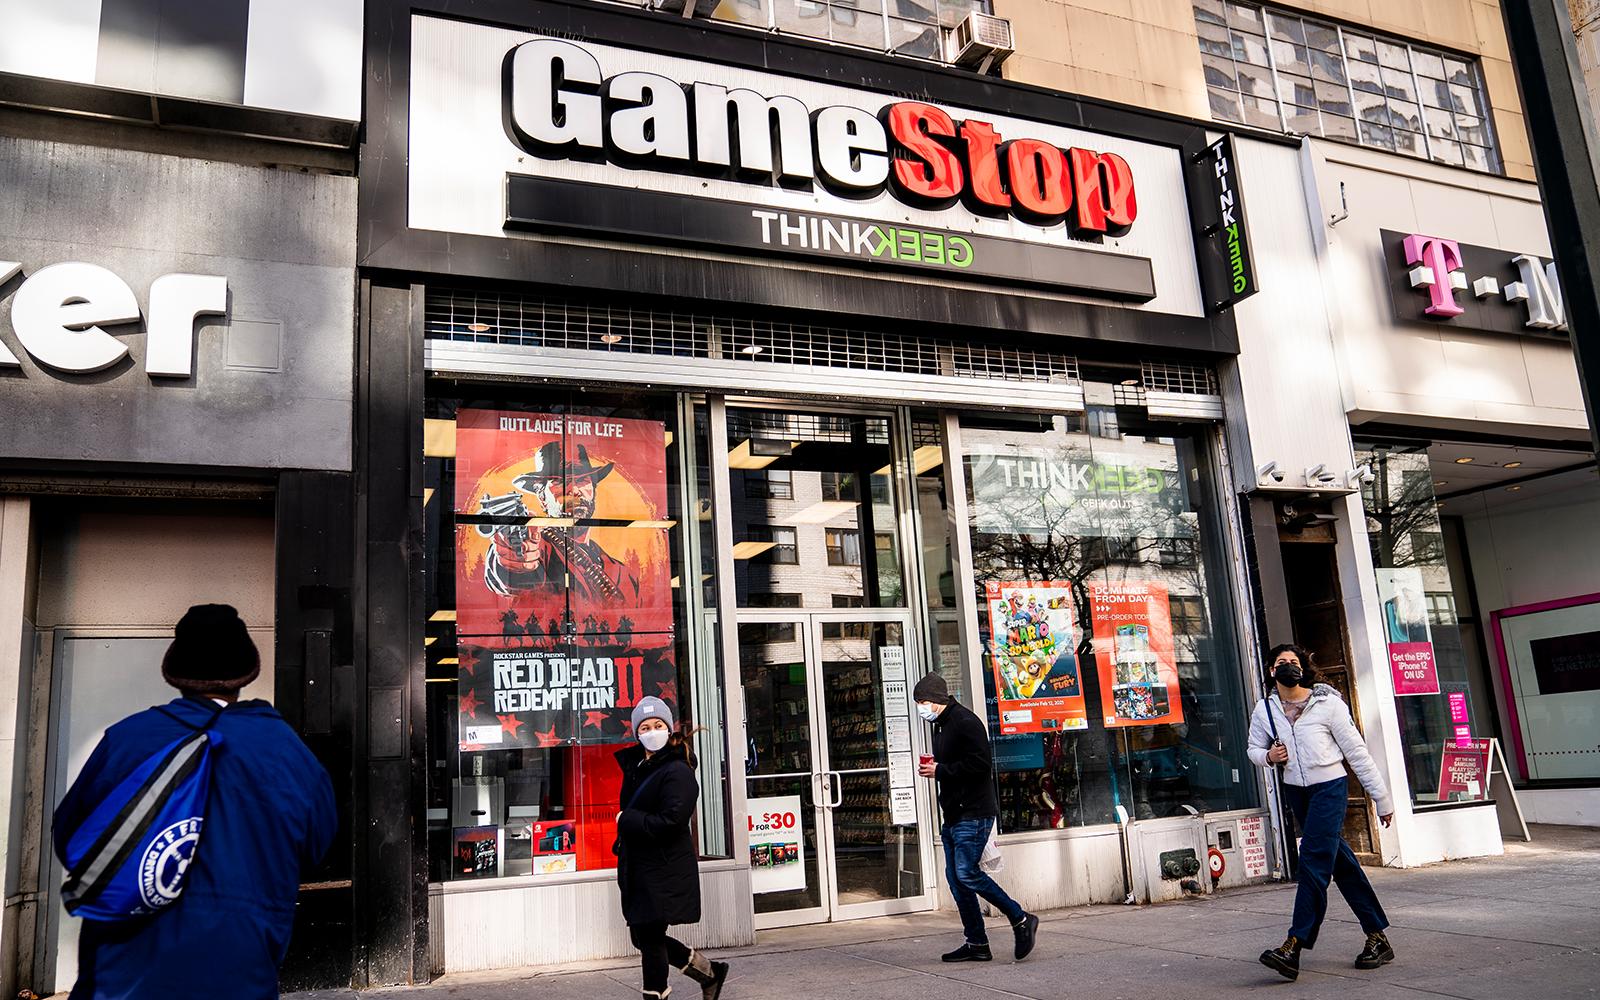 Billionaire Steve Cohen quits Twitter, citing threats in GameStop uproar